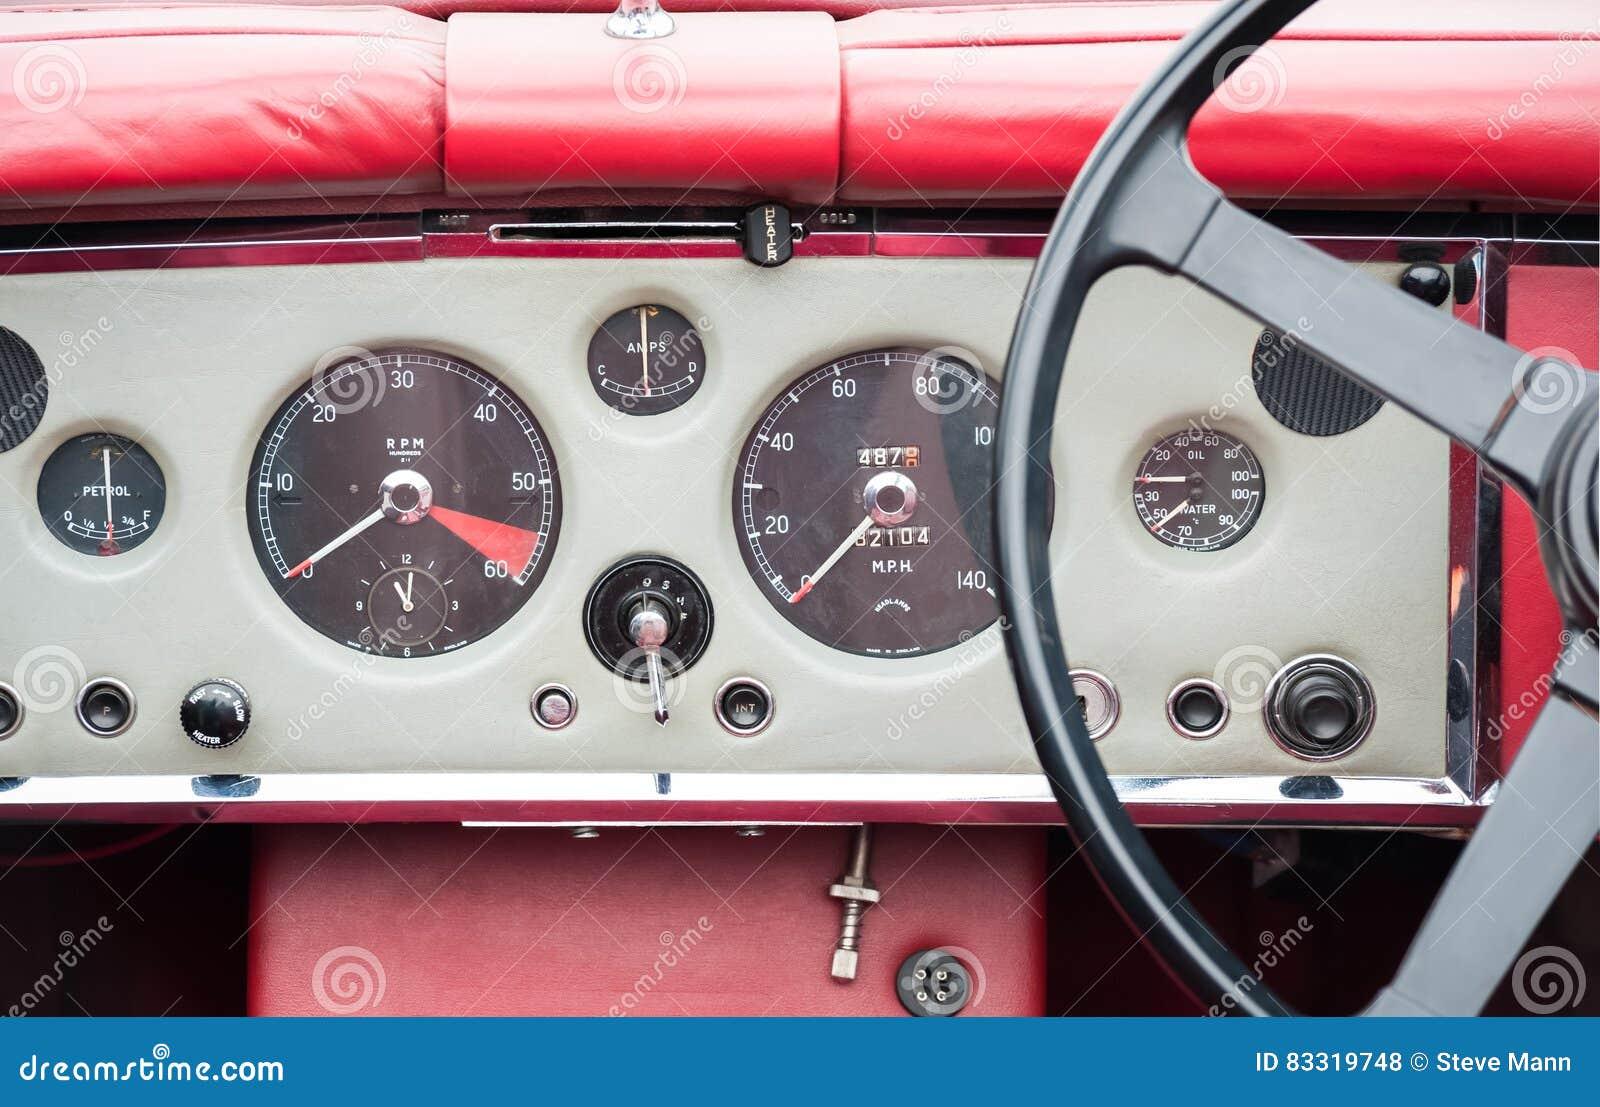 Vintage auto dashboard stock photo. Image of retro, automobiles ...